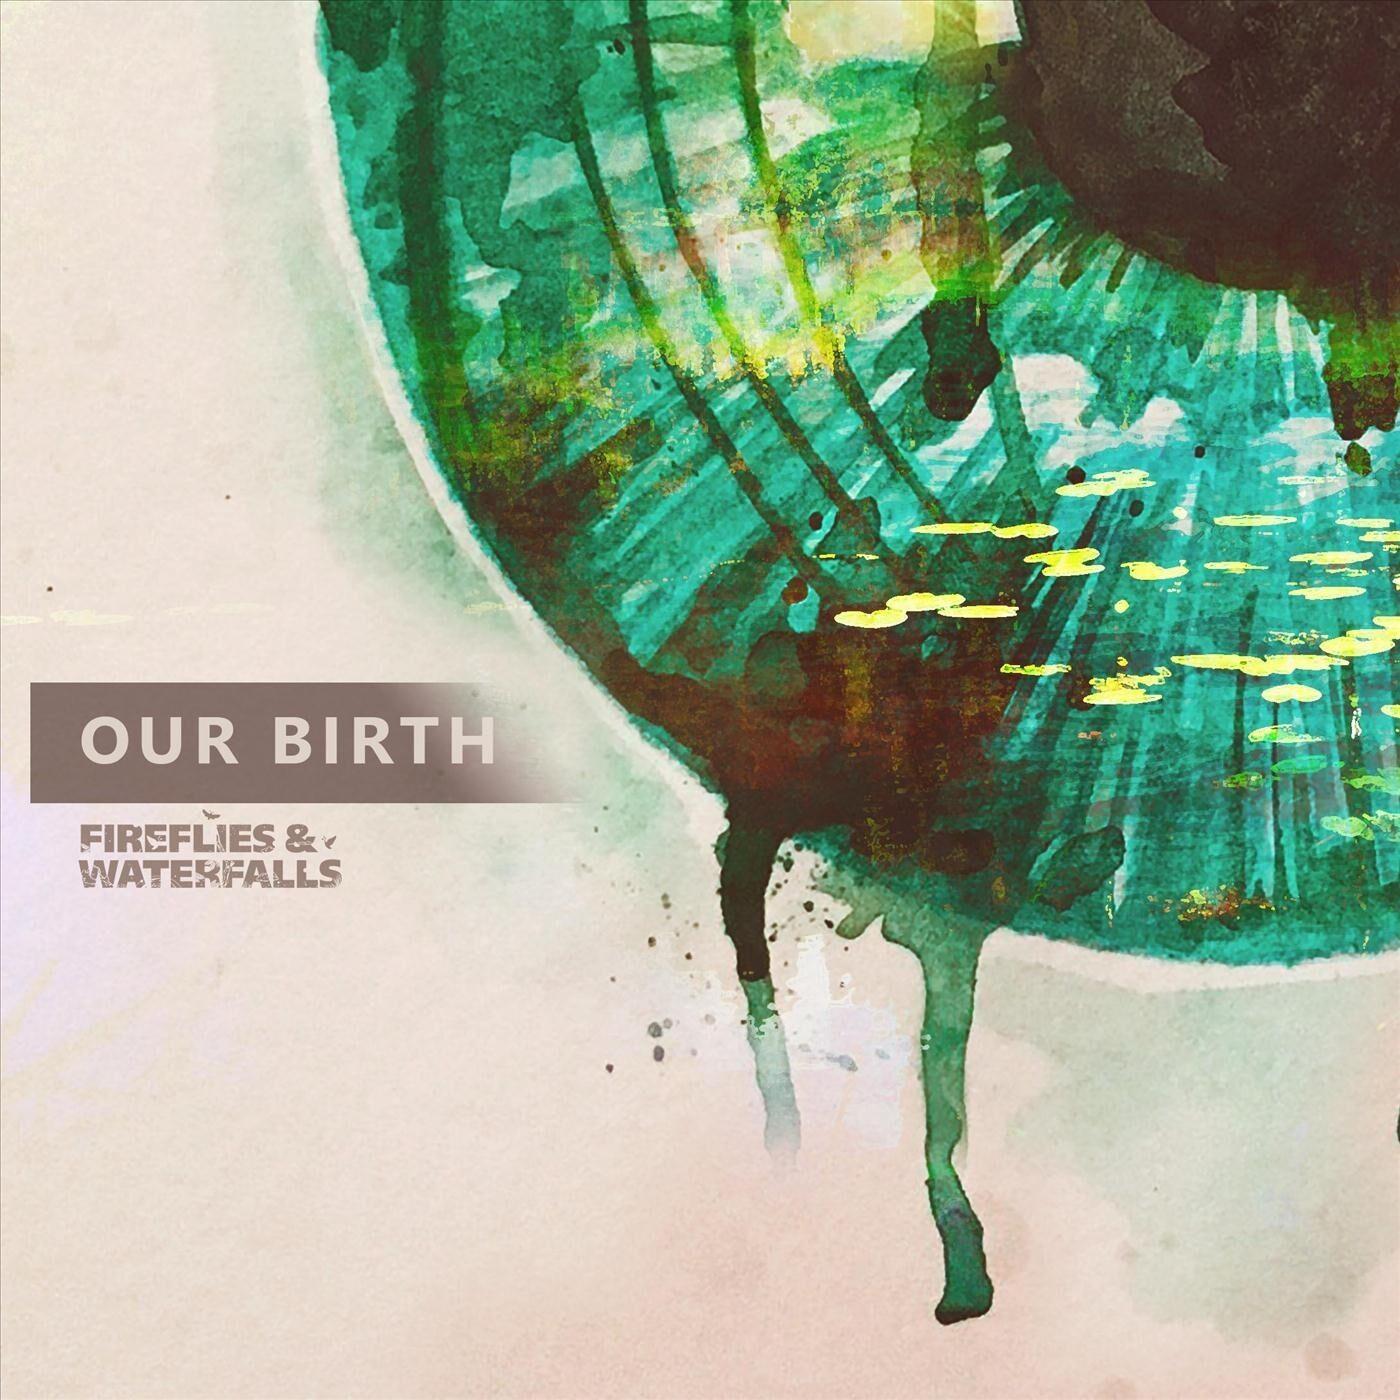 Fireflies & Waterfalls - Our Birth [single] (2019)